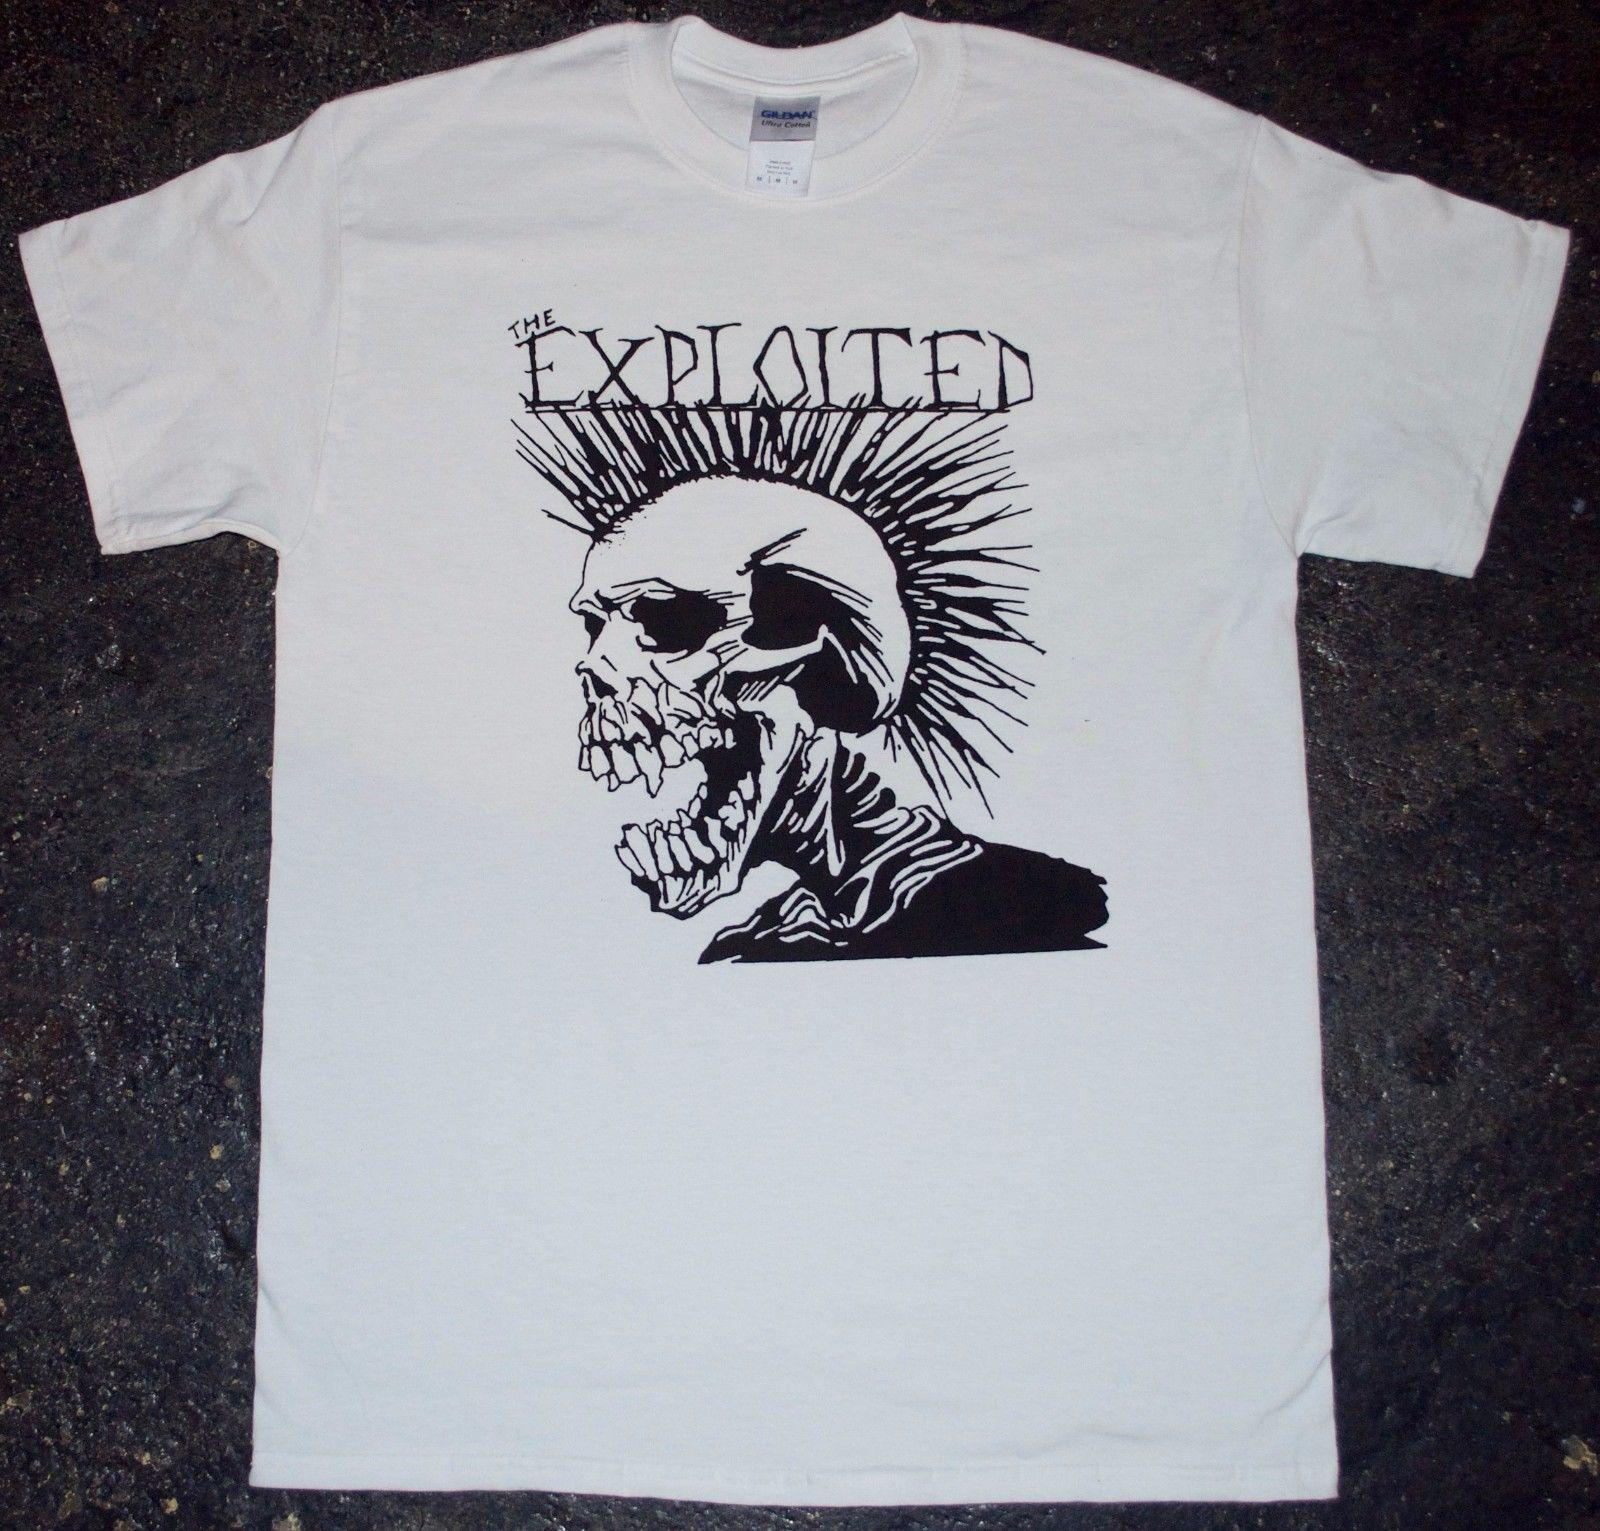 "Camiseta ""Maggie"" explotada (punk oi crass mob discharge varukeers kbd) camiseta barata de moda de verano para hombre"